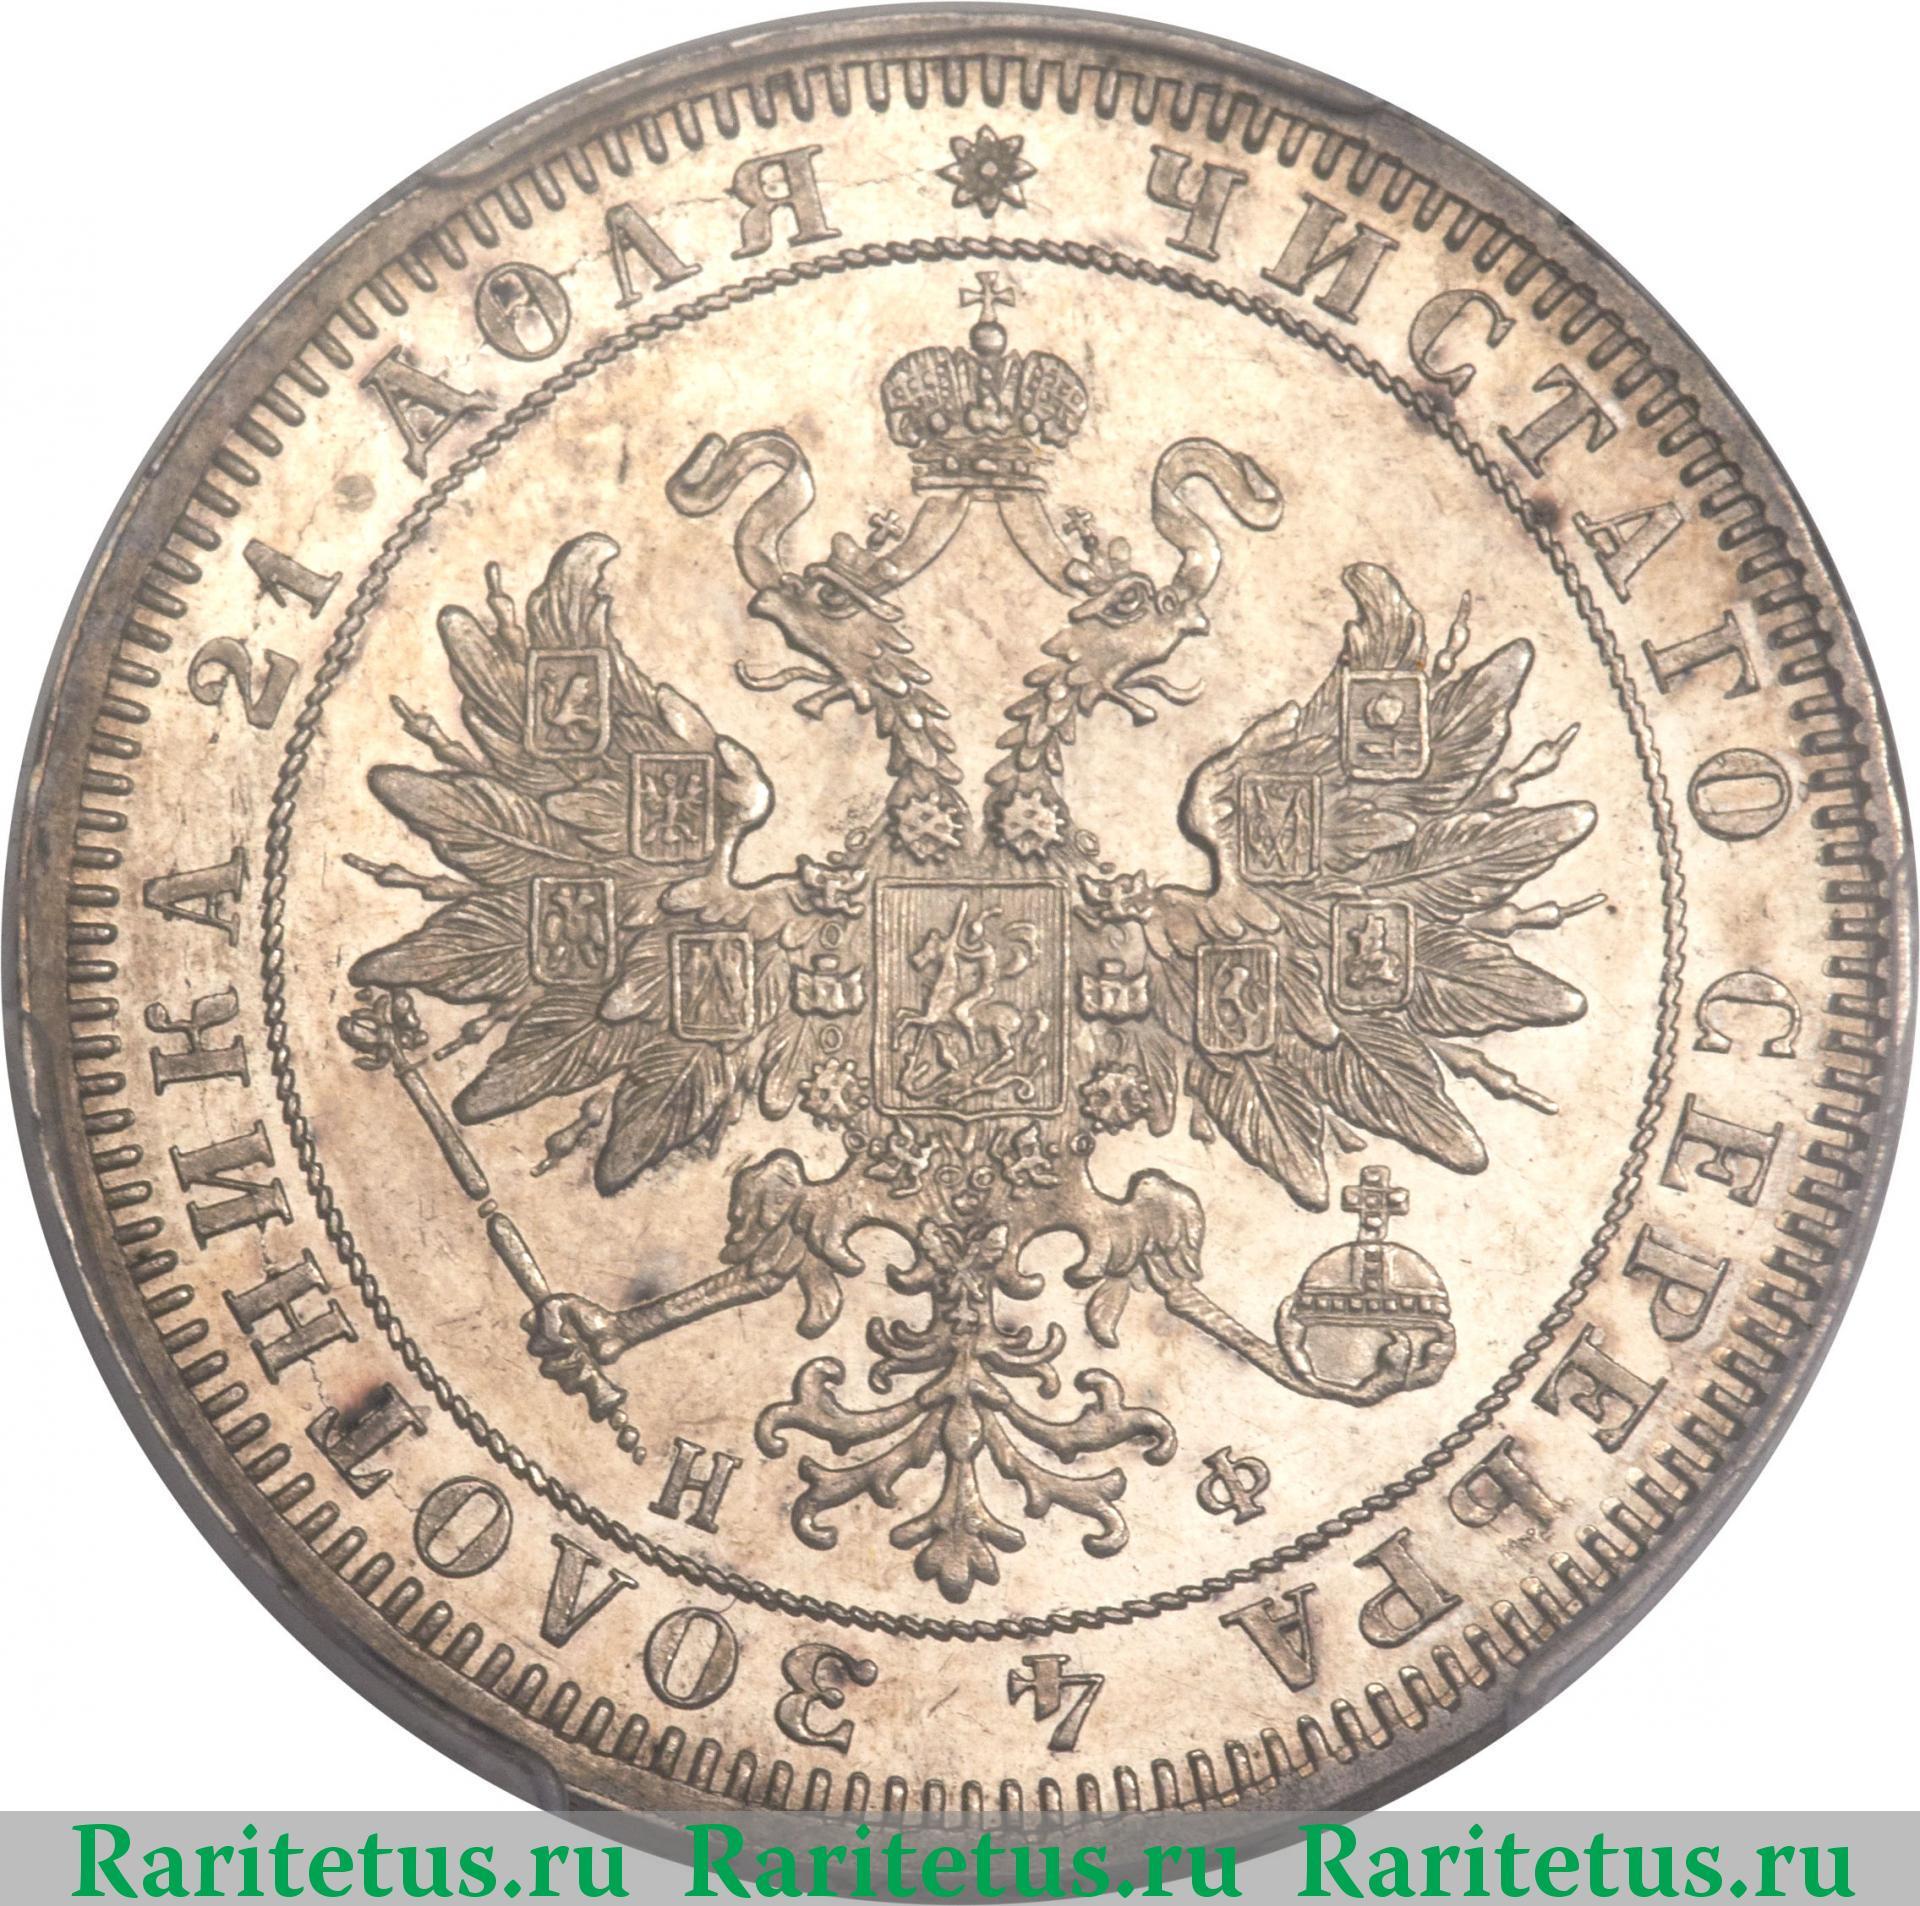 1 рубль 1864 года цена серебро альбом для монет 5 рублей у